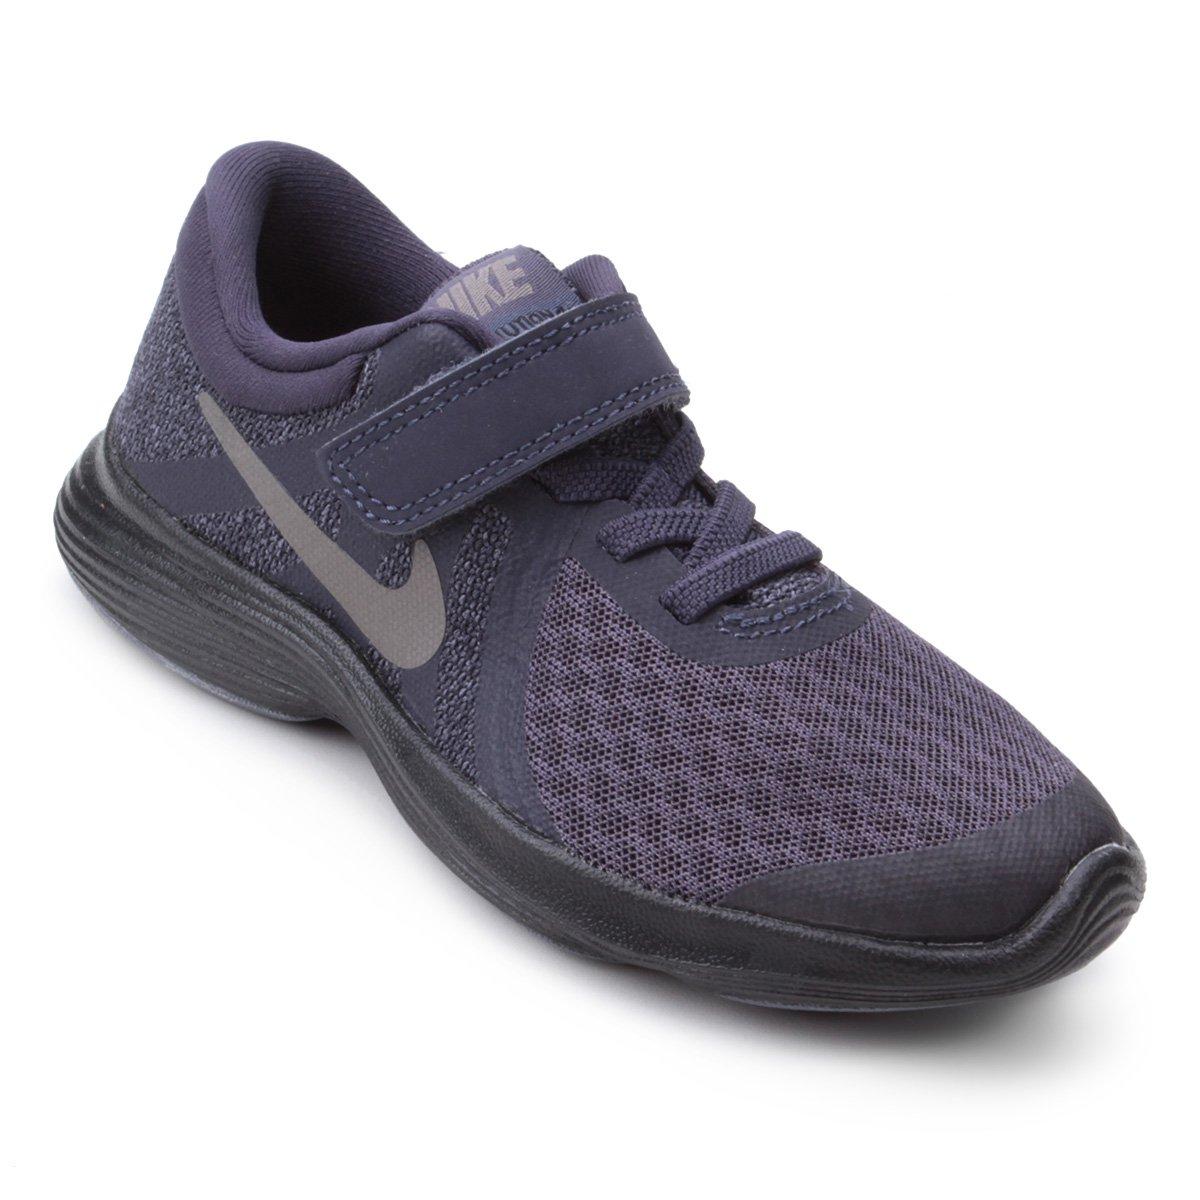 size 40 d08f5 58dff Tênis Infantil Nike Revolution 4 Masculino - Preto e Cinza   Shop Timão